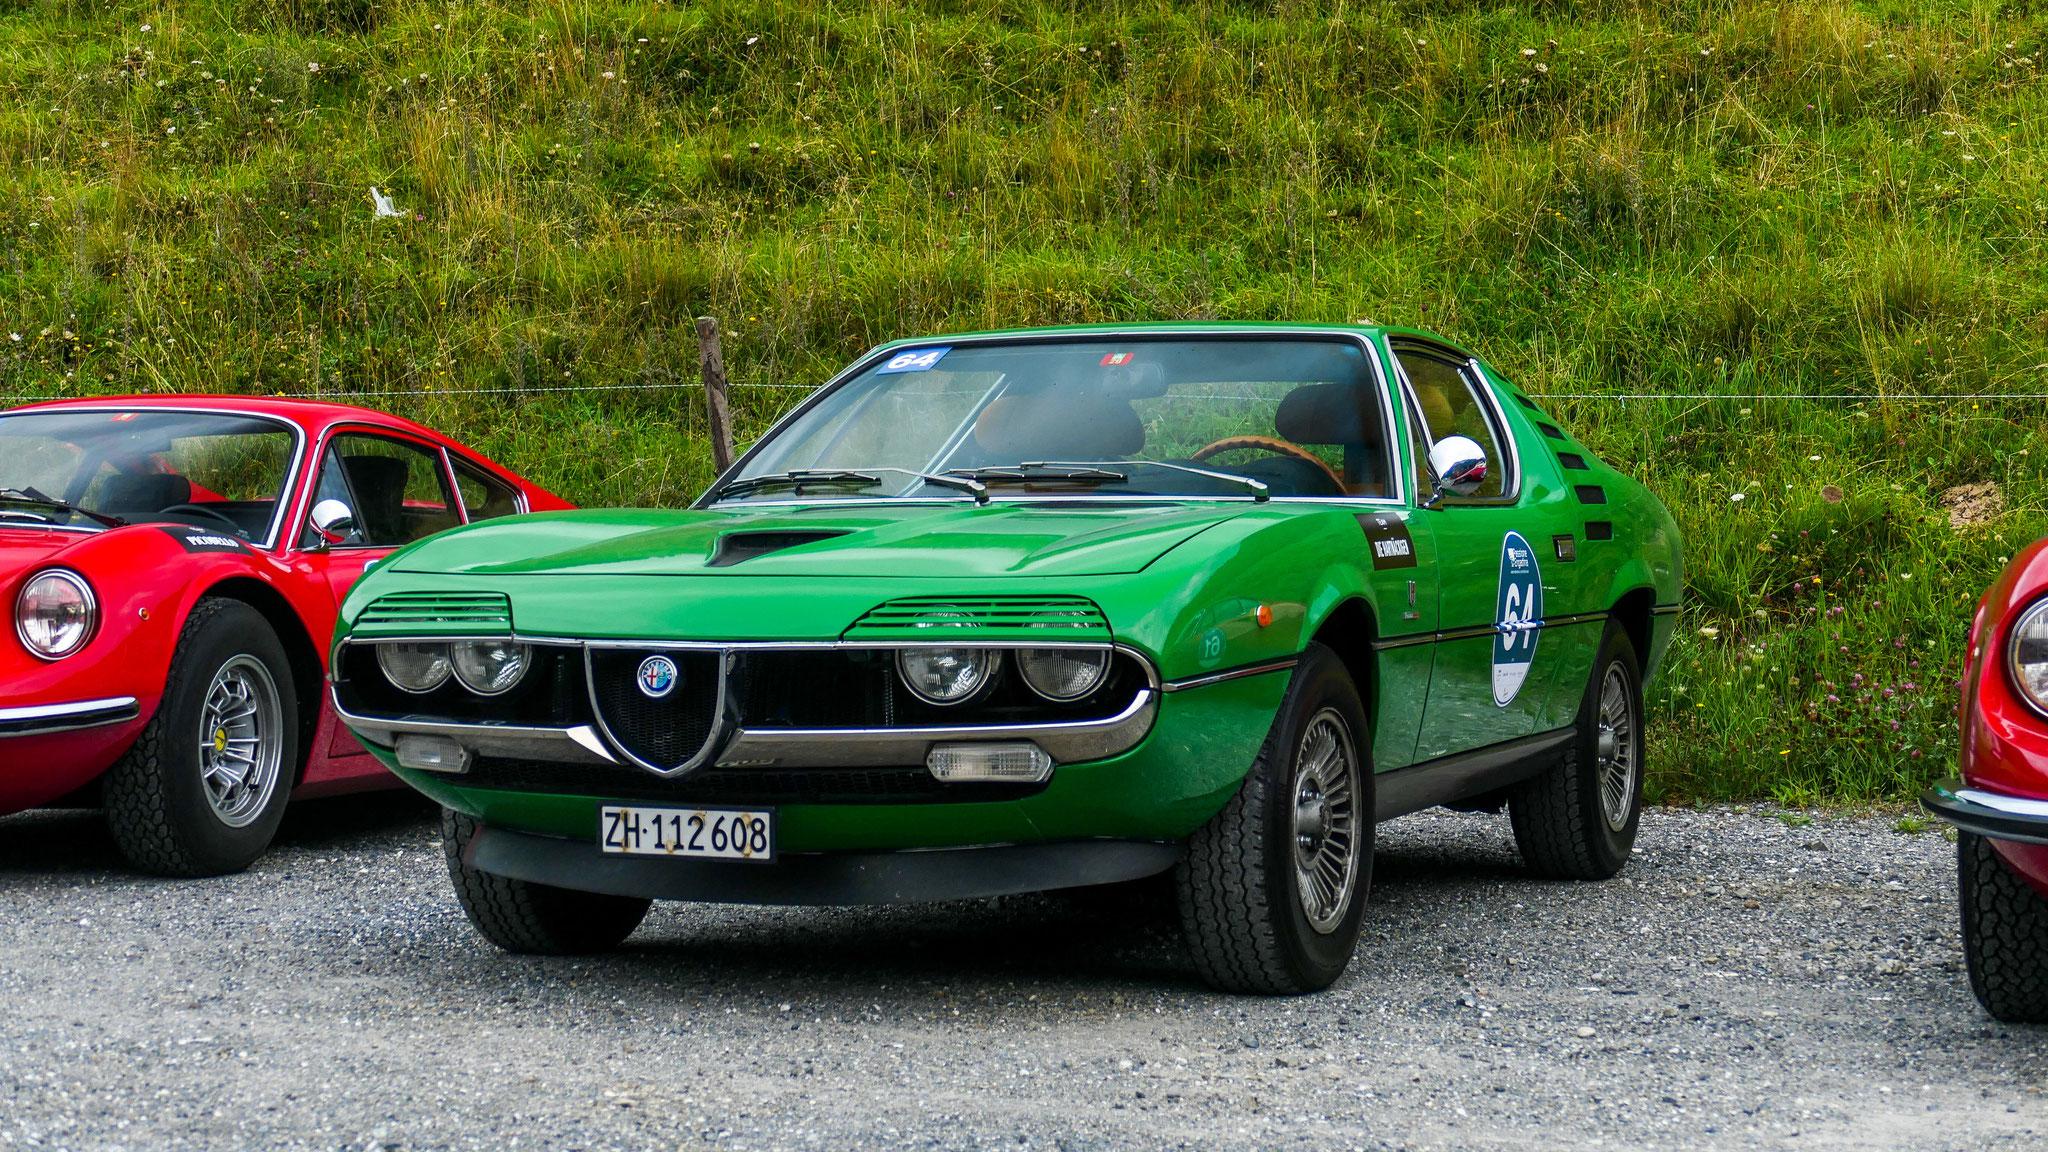 Alfa Romeo Montreal Bertone - ZH-112608 (CH)